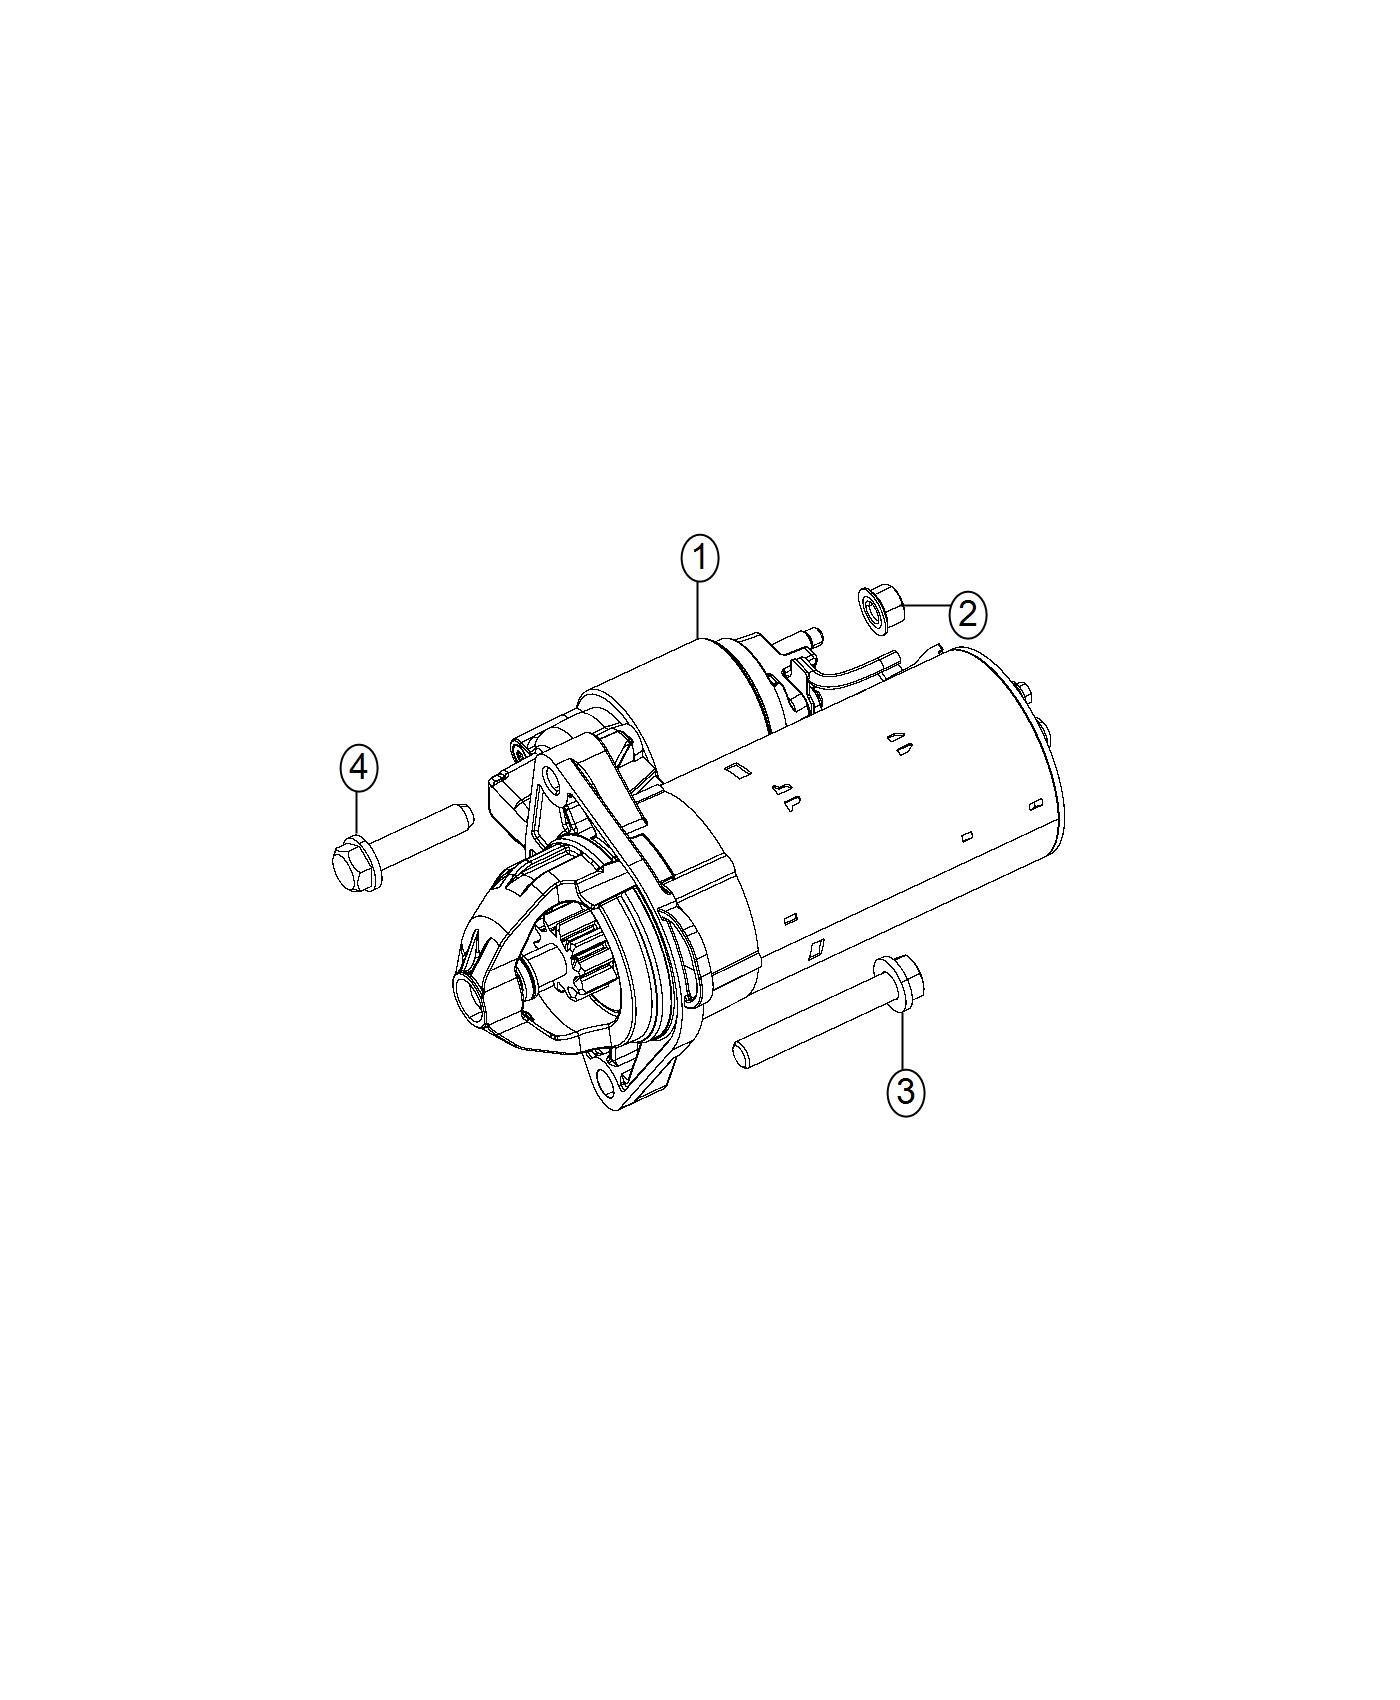 Ram Starter Engine System Stop Maintenance